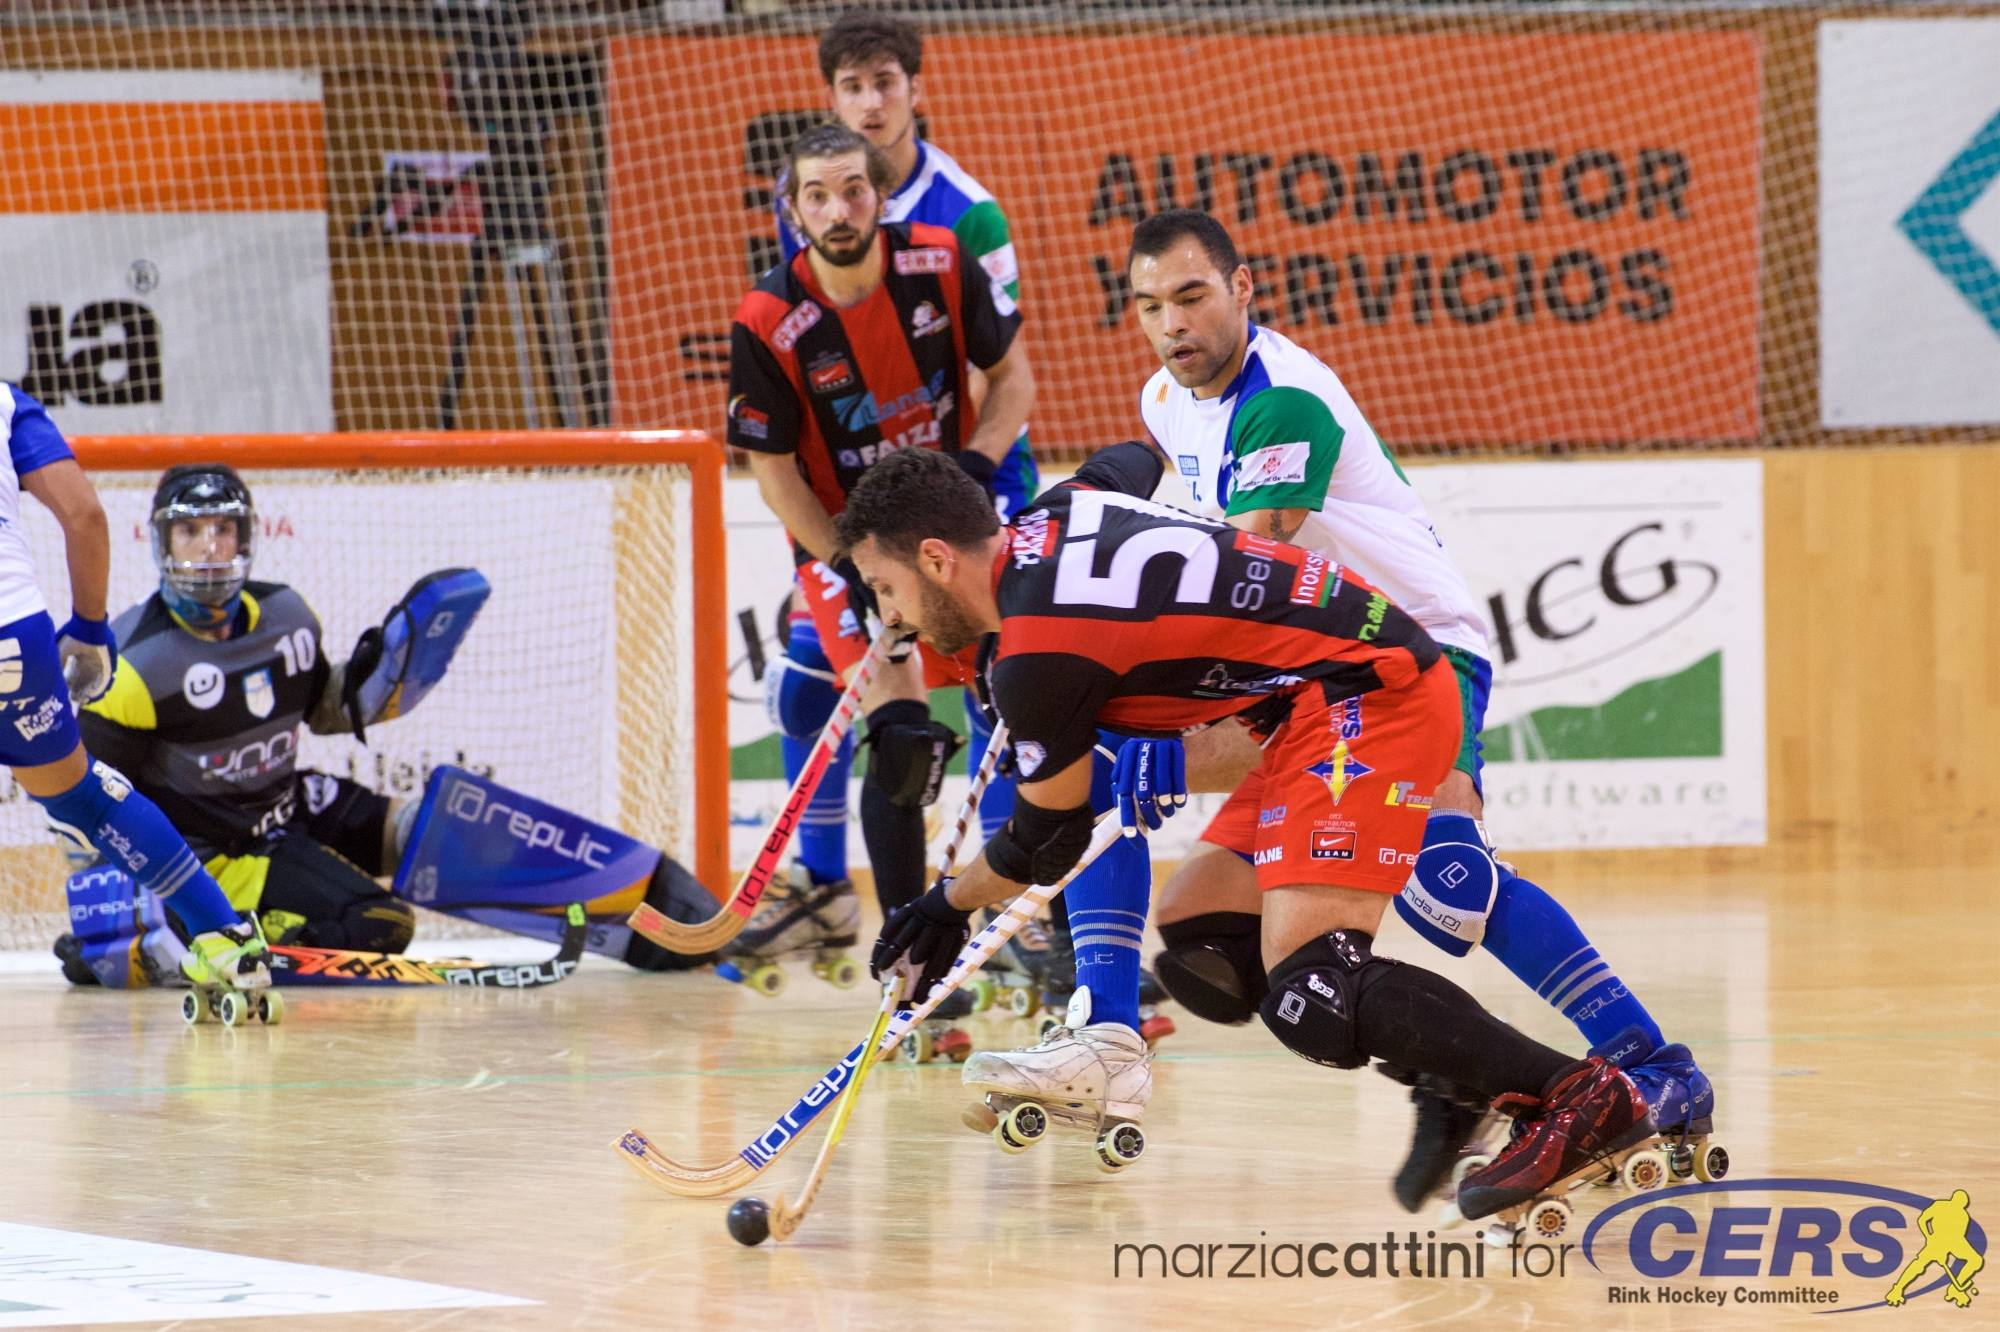 PHOTOS - 28/04/2018 - CERS CUP - Match #119 – Semifinal #2 – CP Voltregà (SP) v OC Barcelos (PT) - Photos by Marzia Cattini